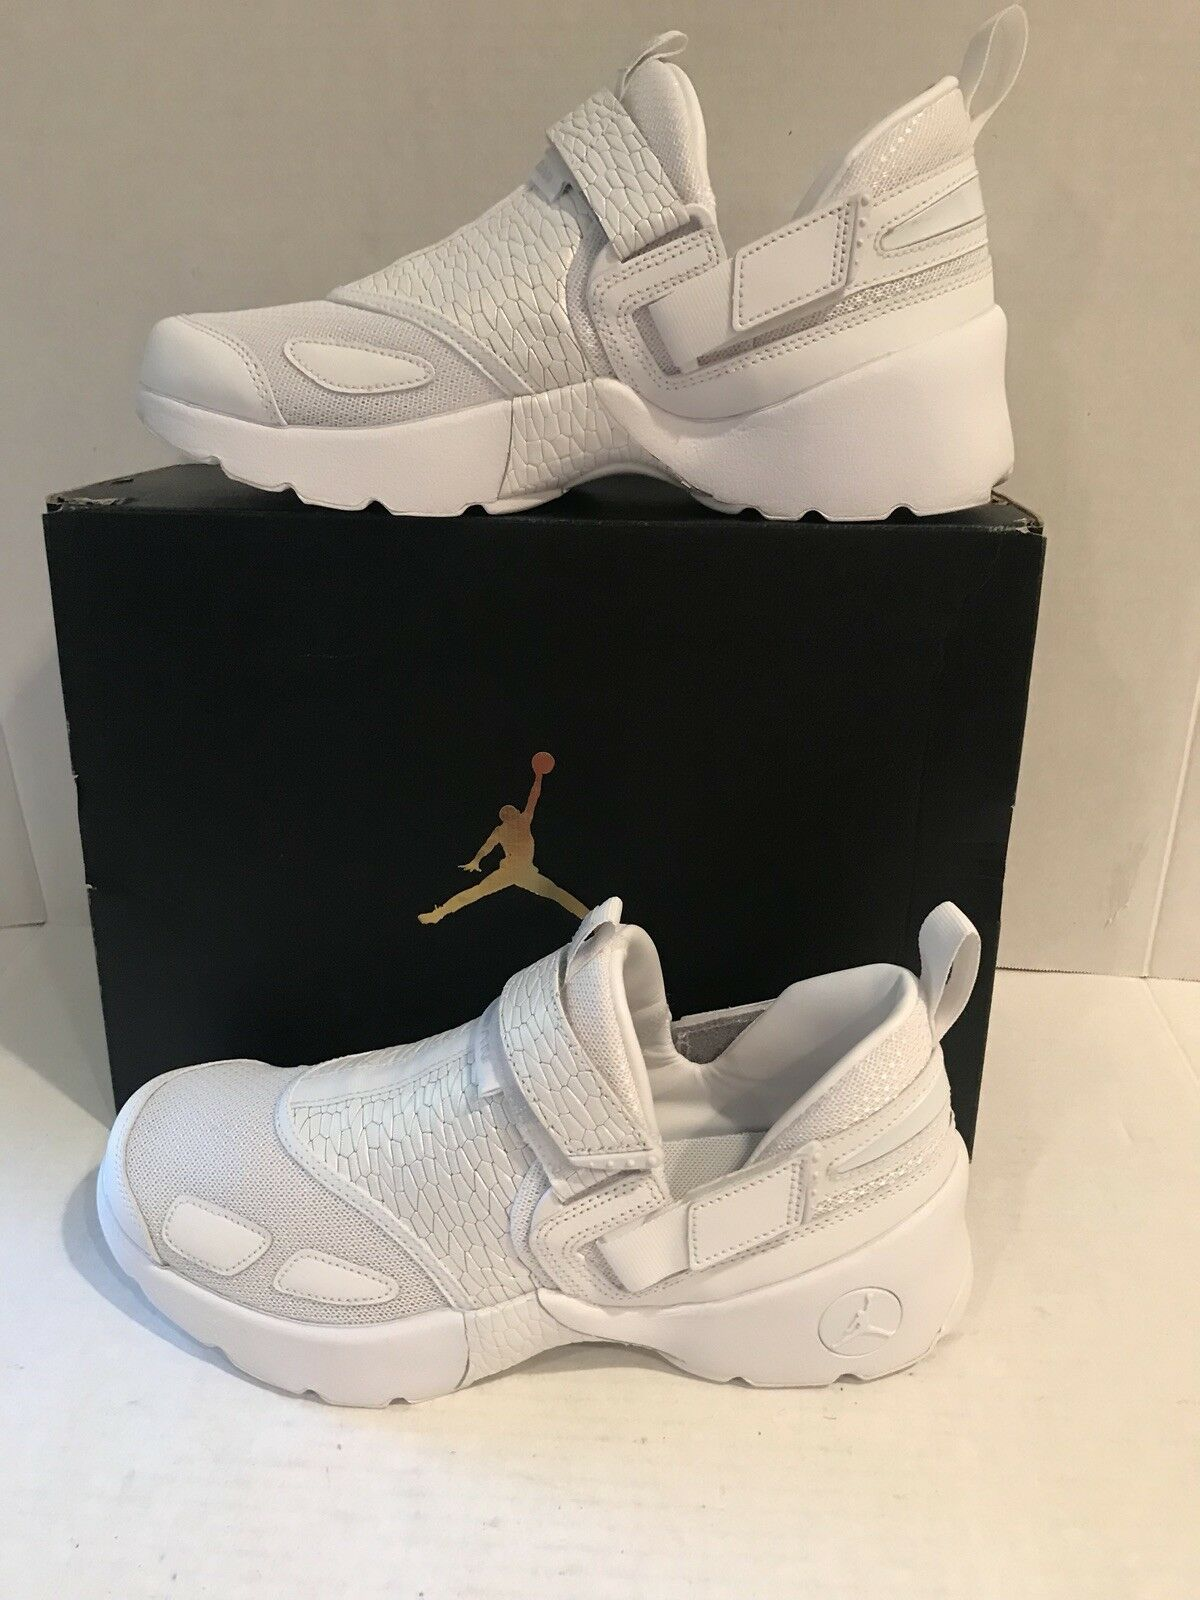 Nike Air Jordan Trunner LX PR HC GG 897997 100 White/Platinum Size 8Y MSRP$140